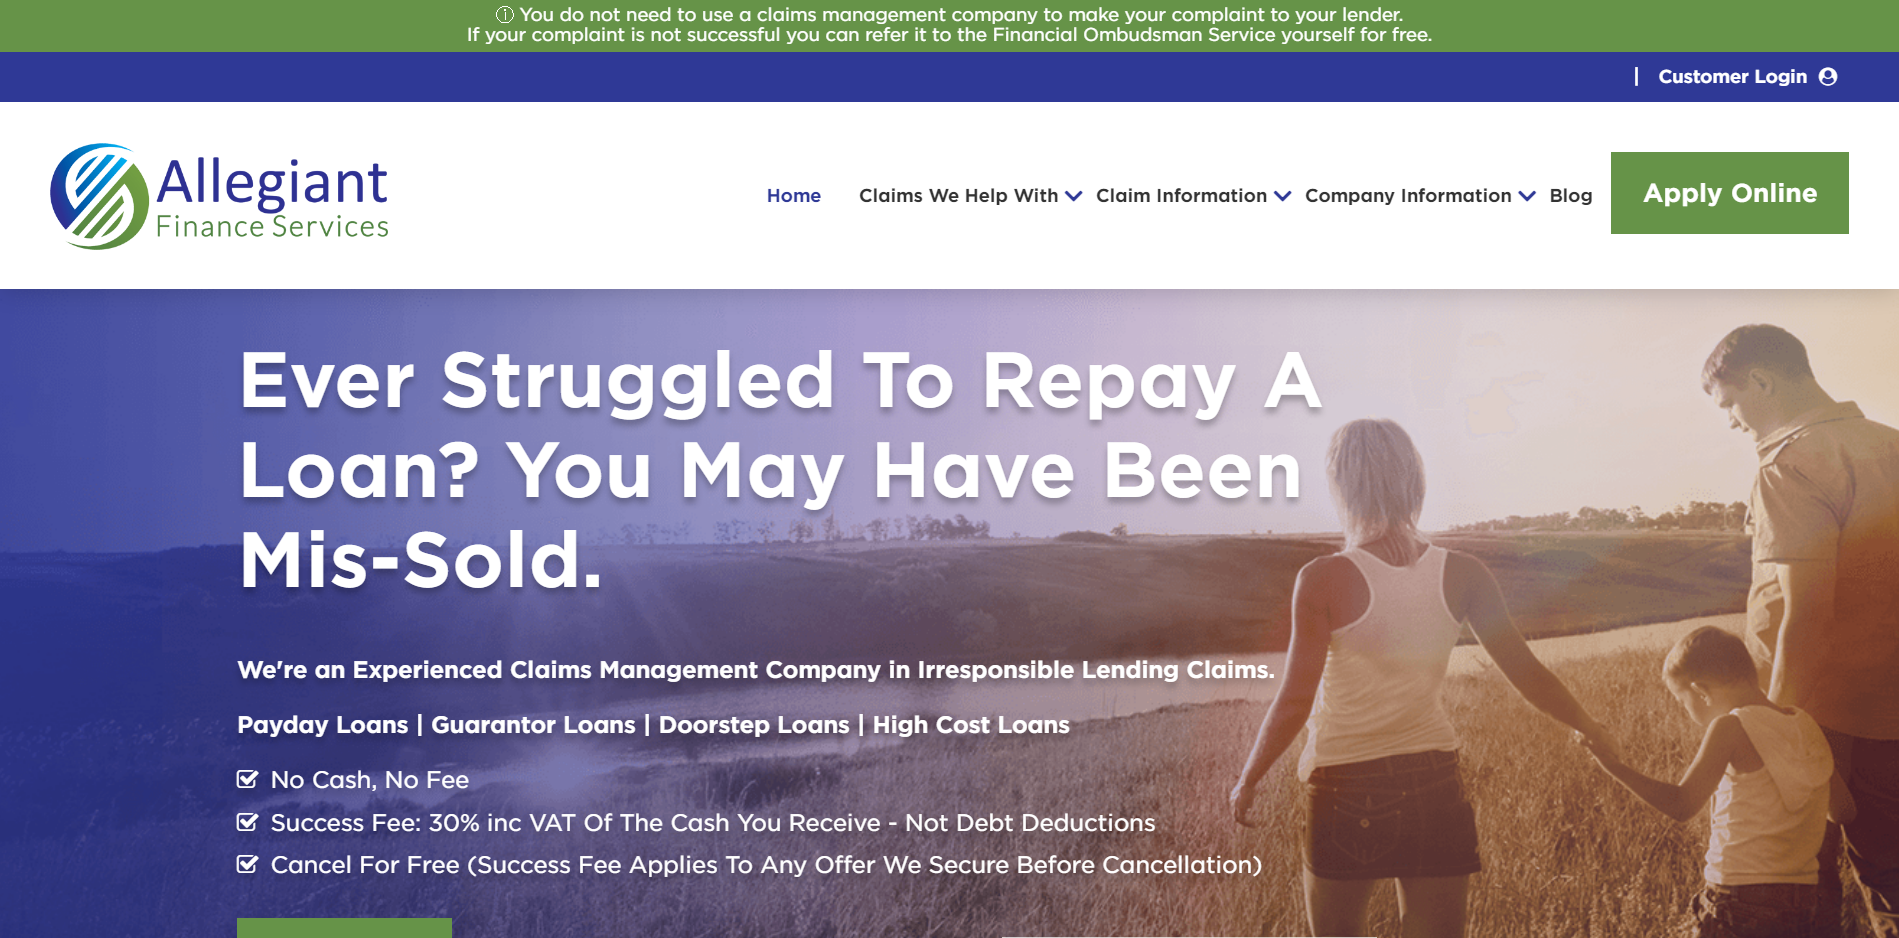 Allegiant Financial Services